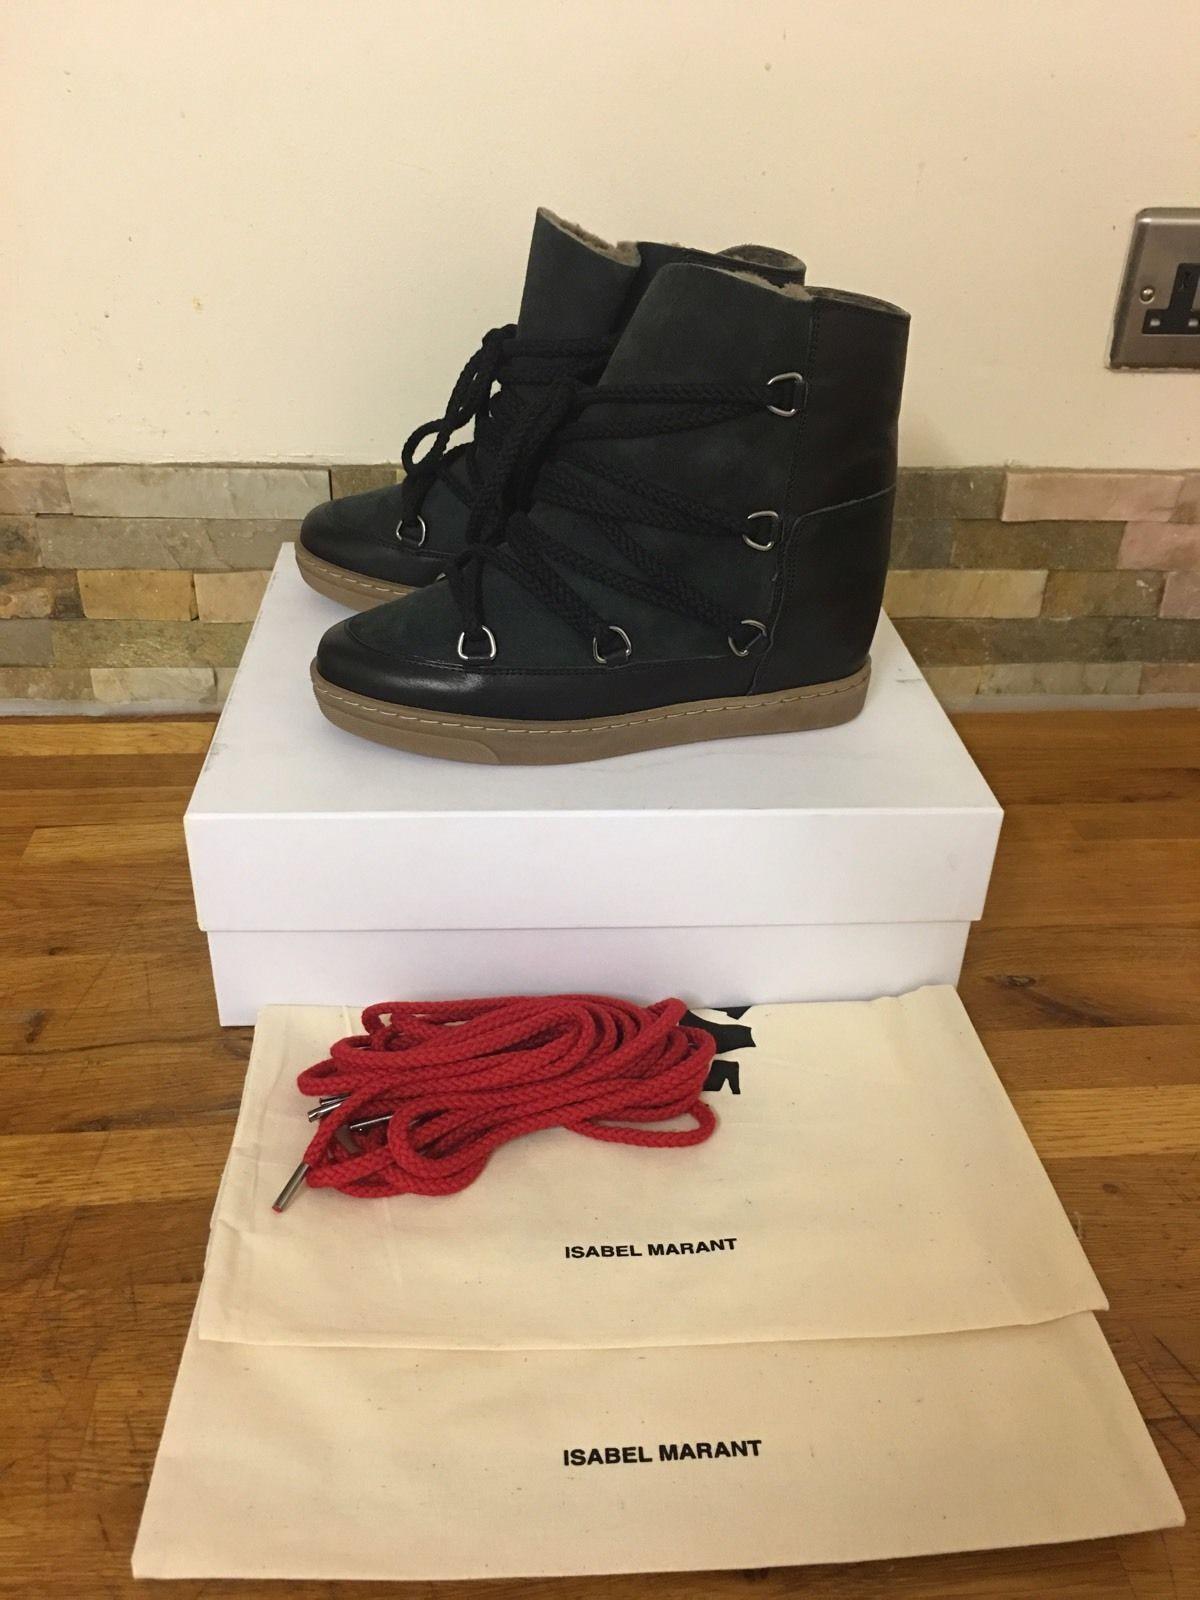 Isabel Marant Etoile Nowles Suede   Leather Shearling Forrado Botas al  Tobillo 0466a3f3c1e9